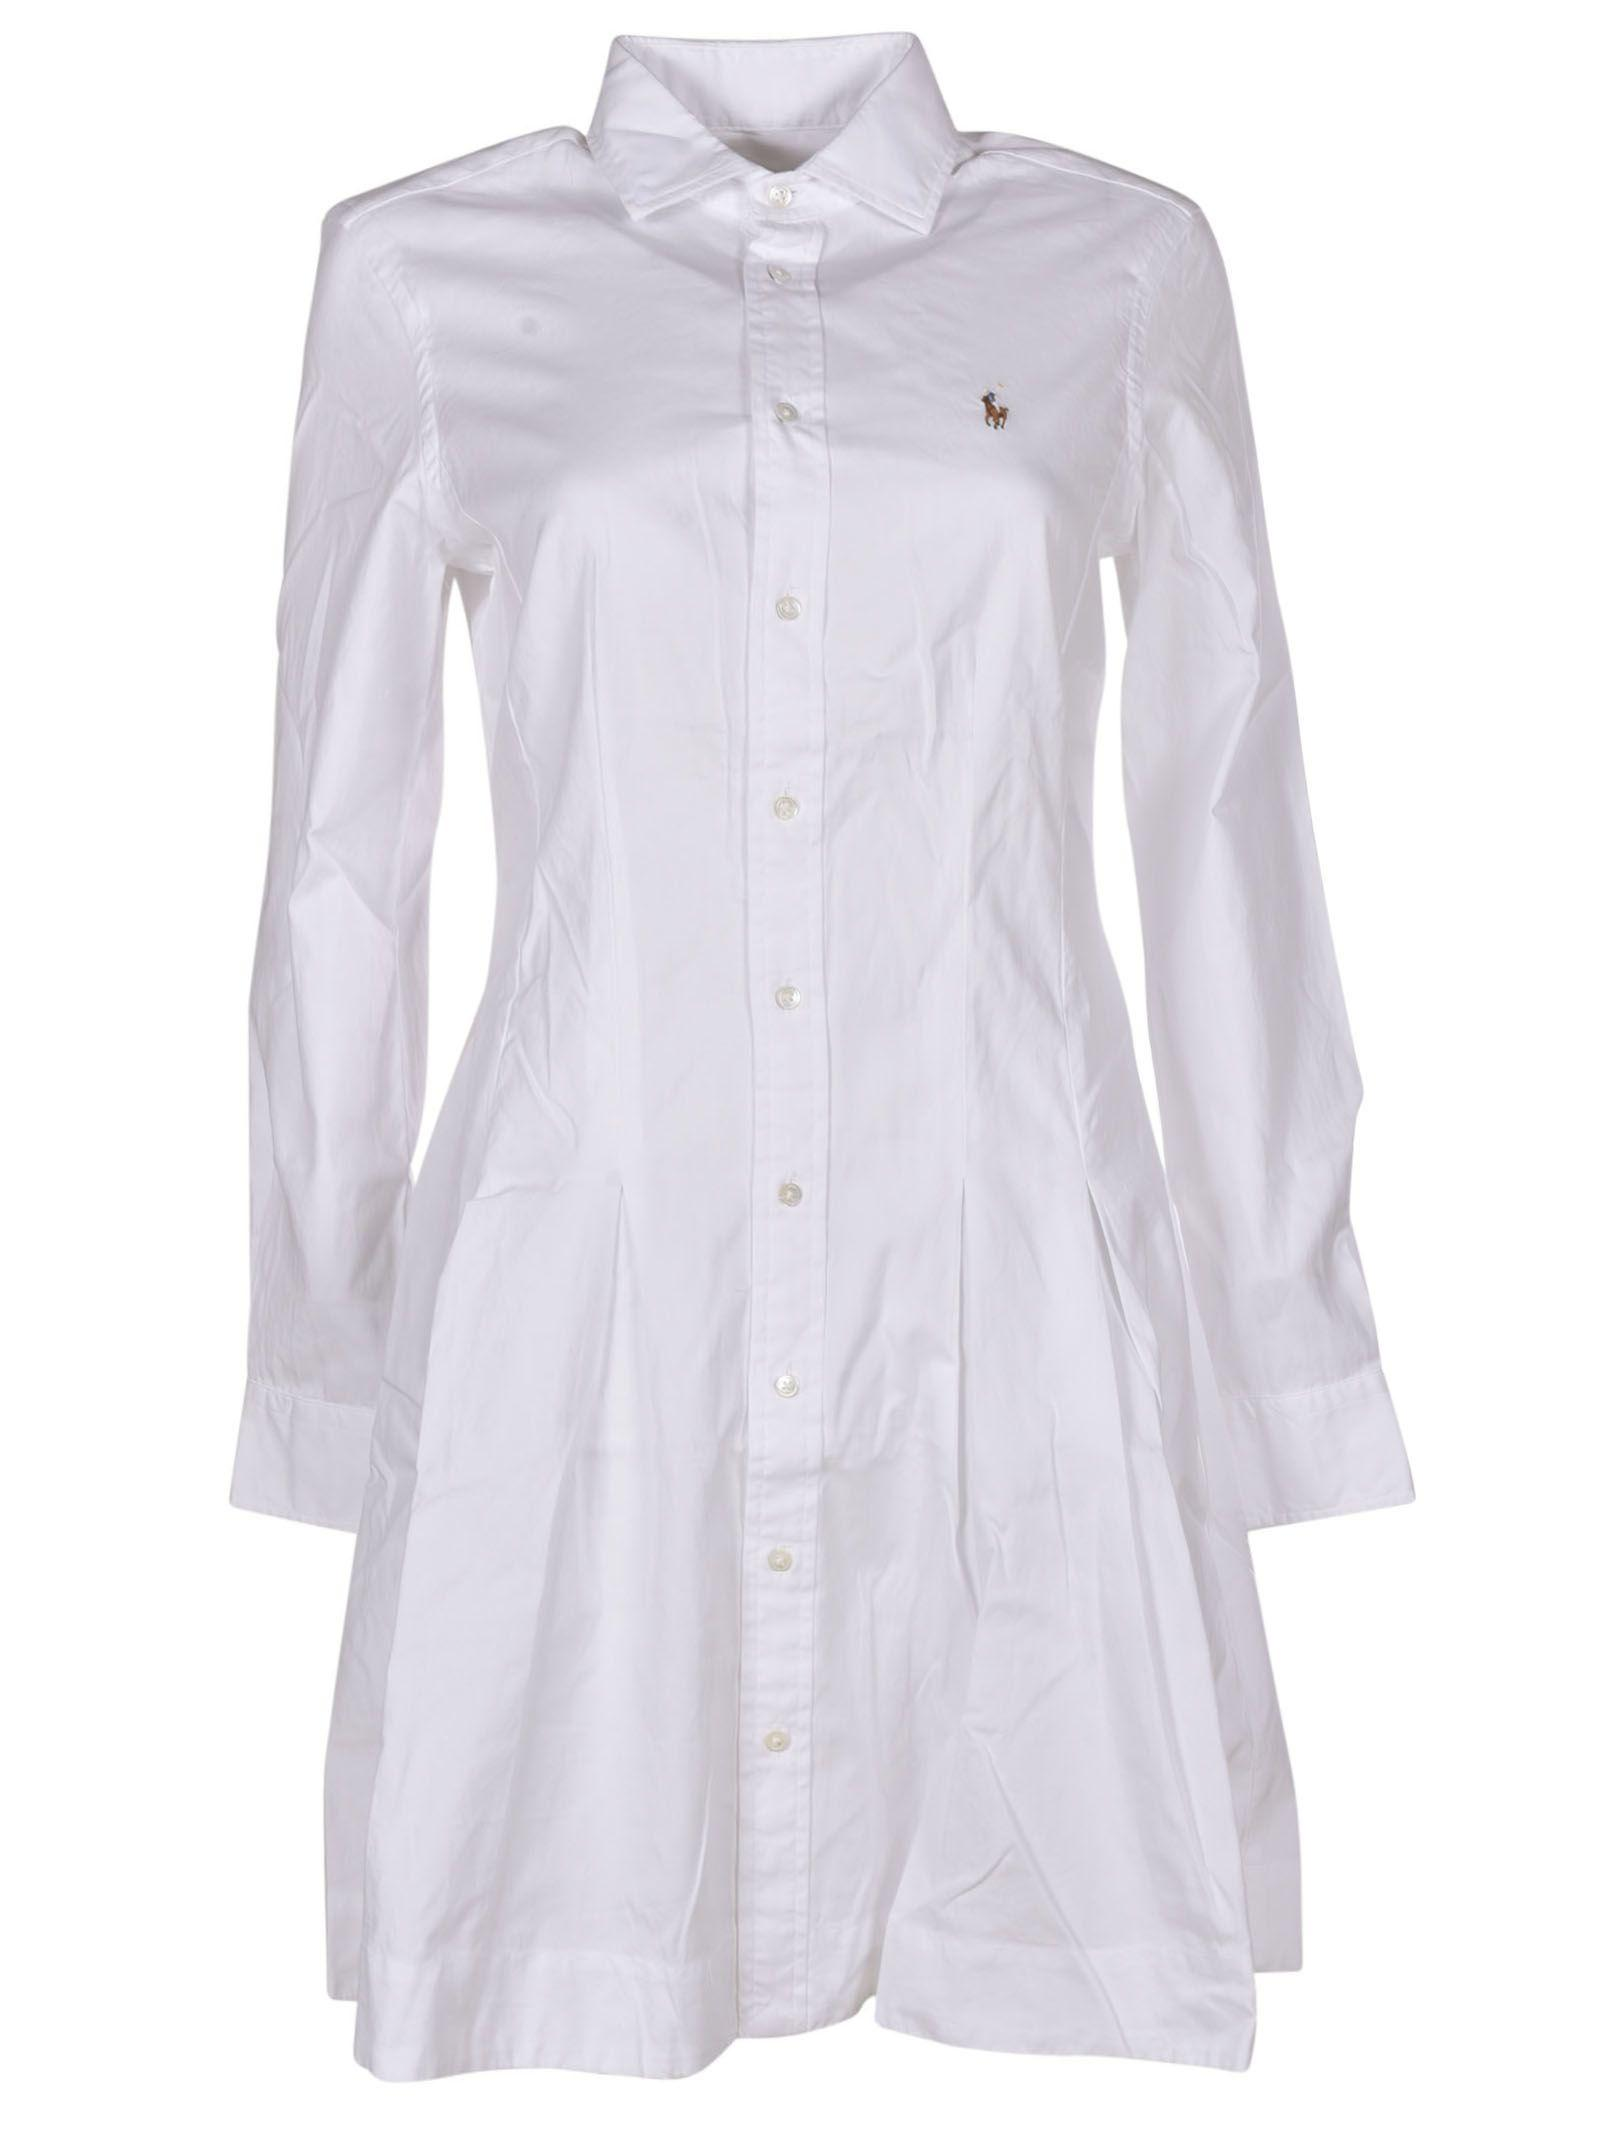 Oxford Shirt Dress In White